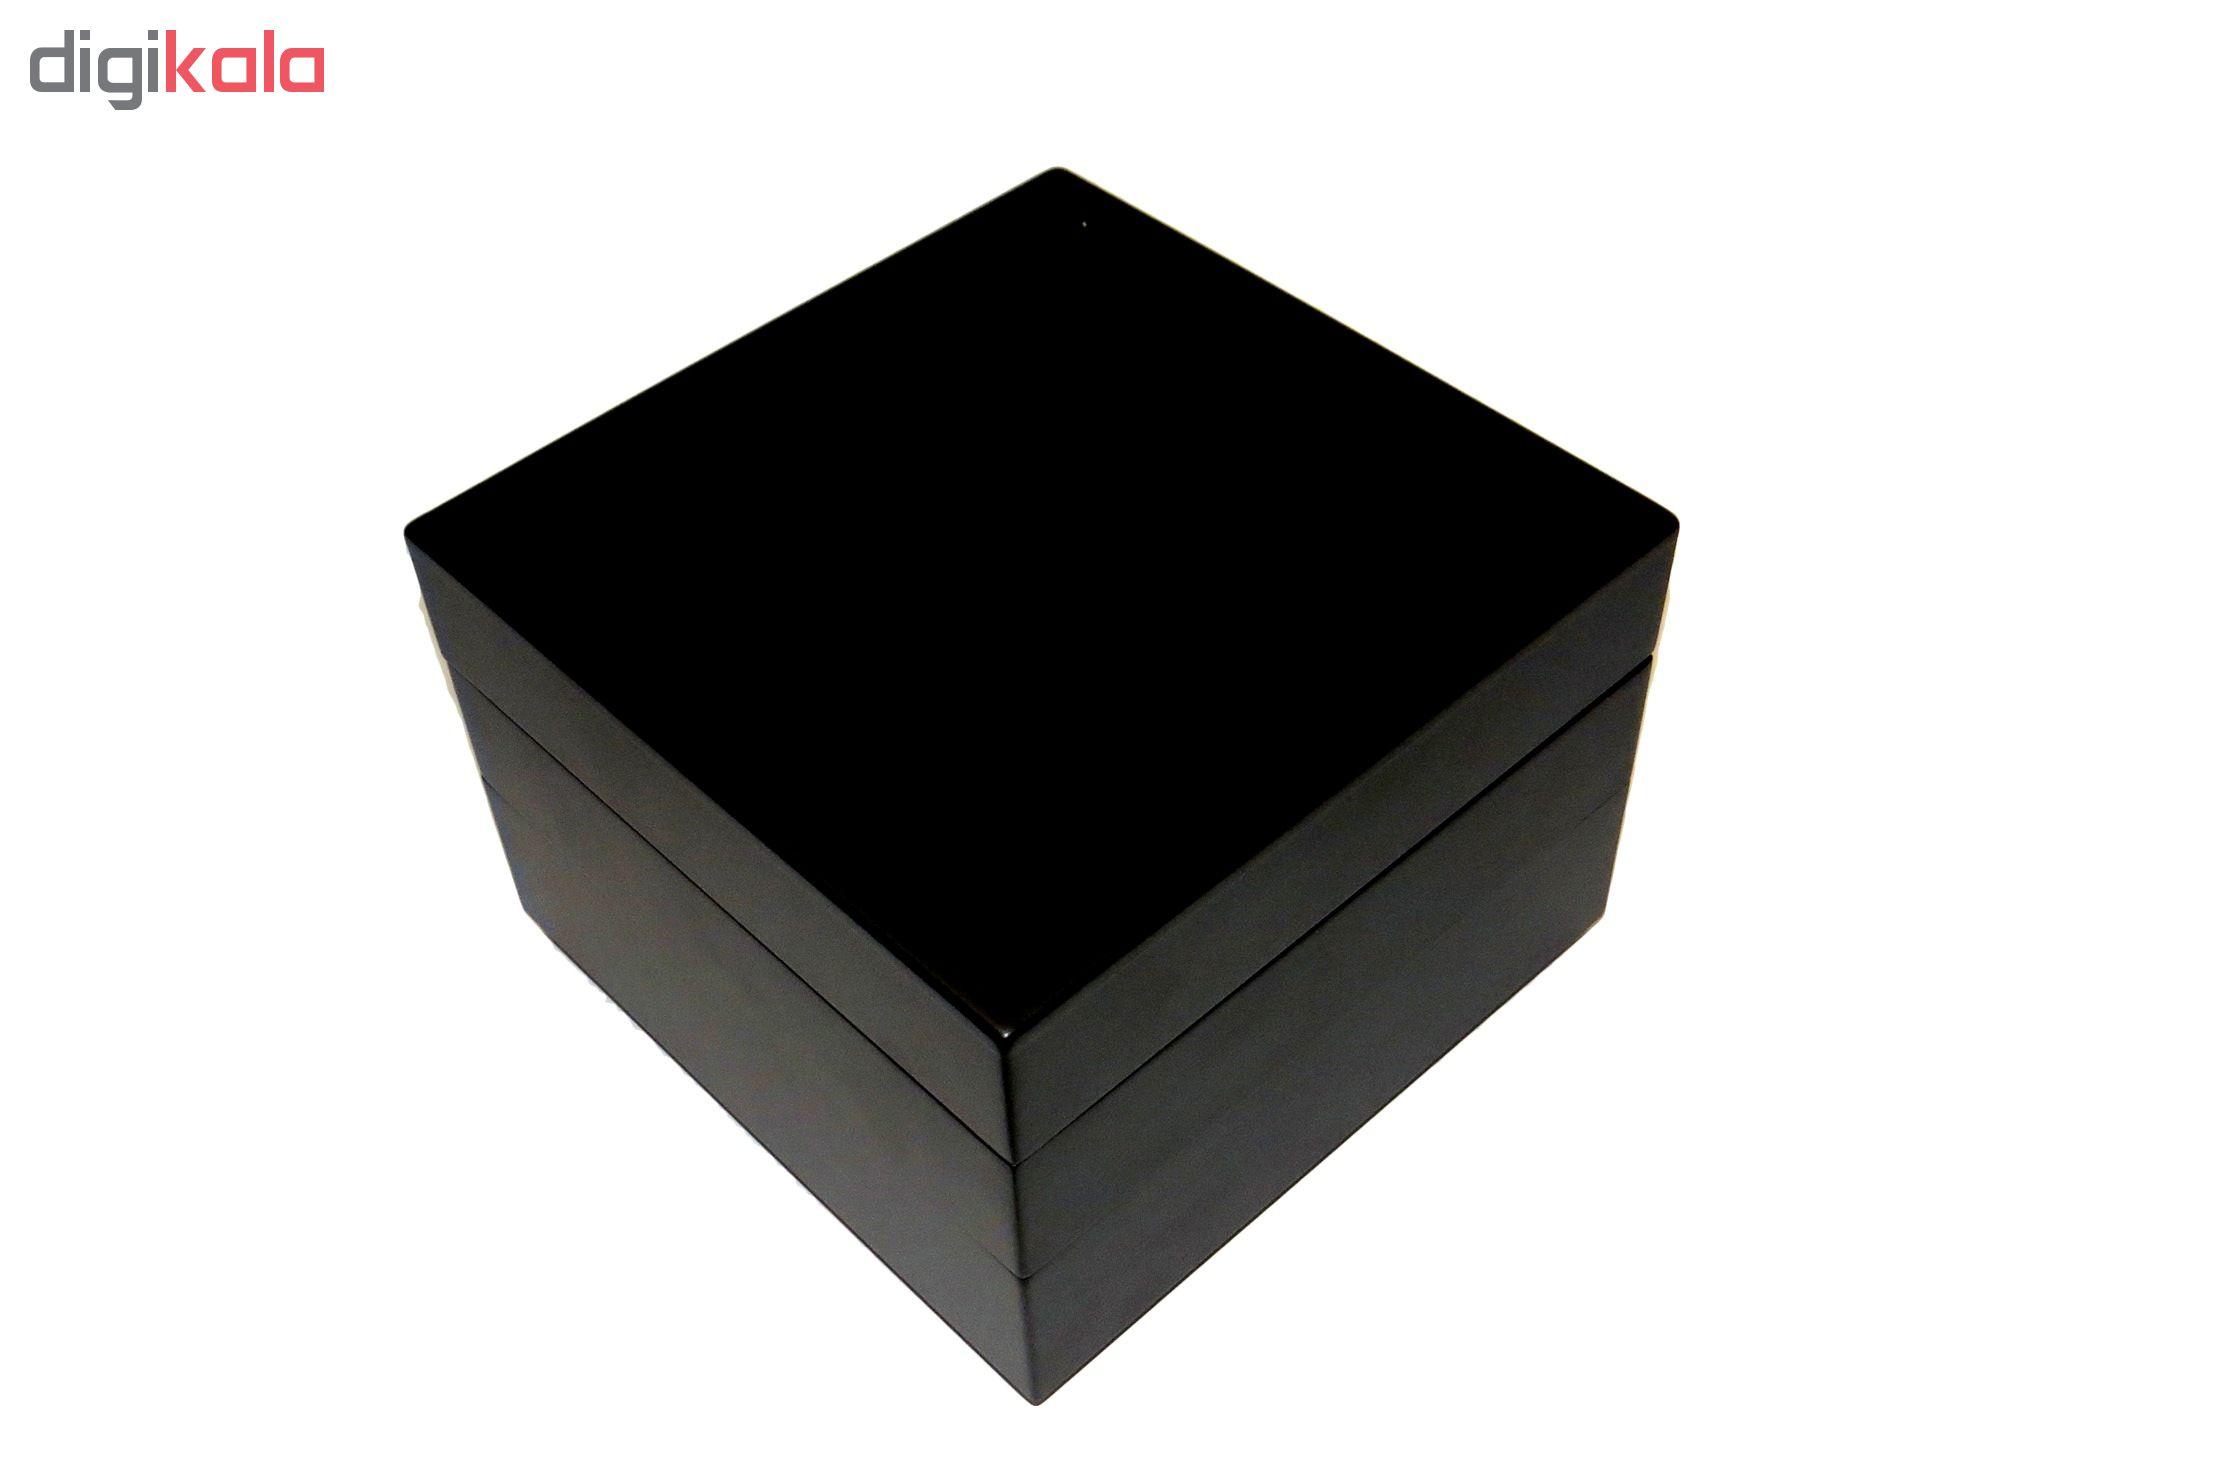 فنجان لکسون مدل LH 18W بسته 12 عددی